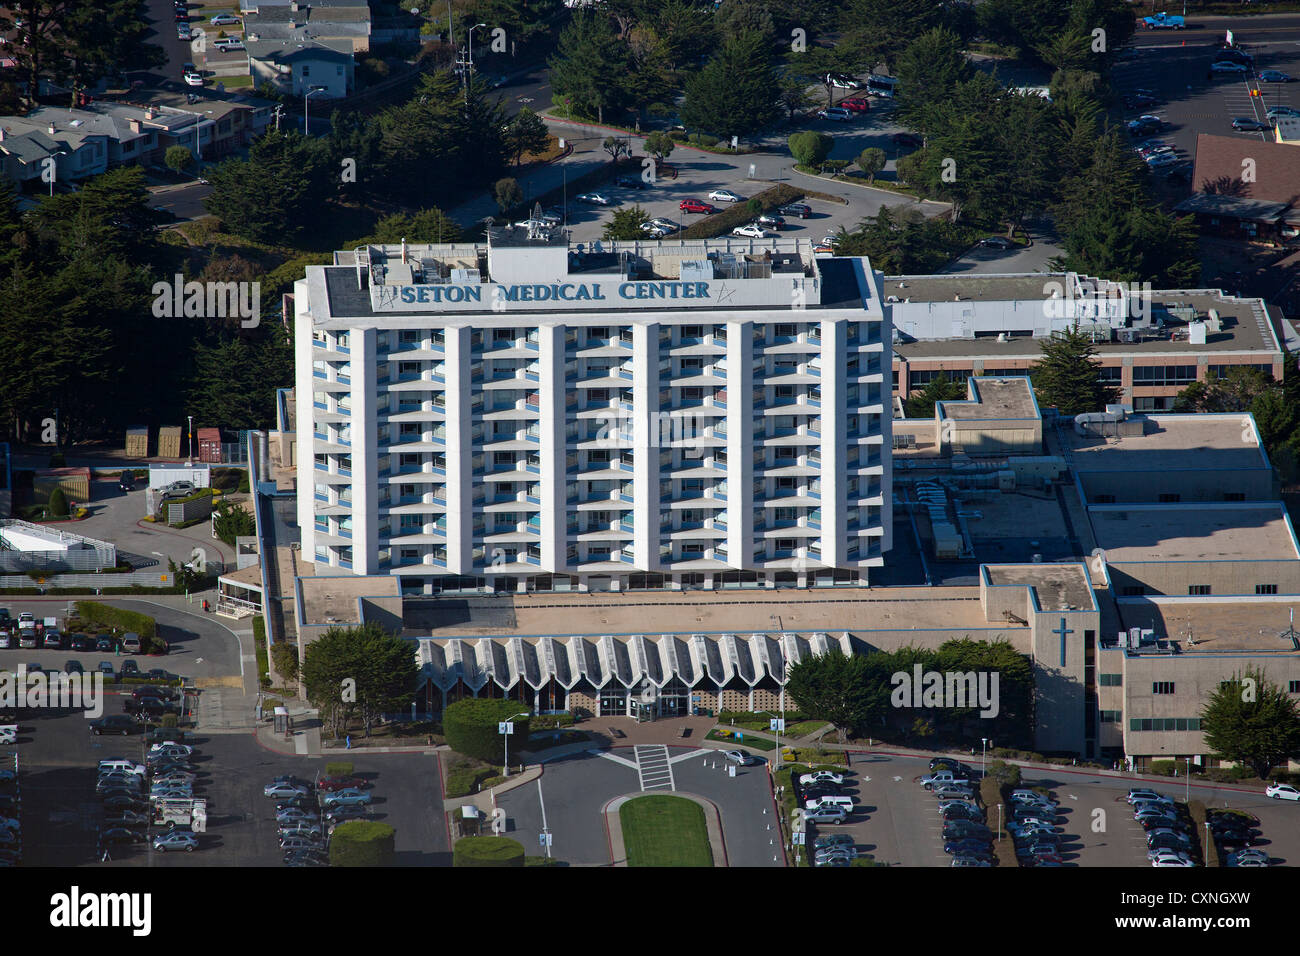 aerial photograph Seton Medical Center, Daly City, San Mateo county, California - Stock Image